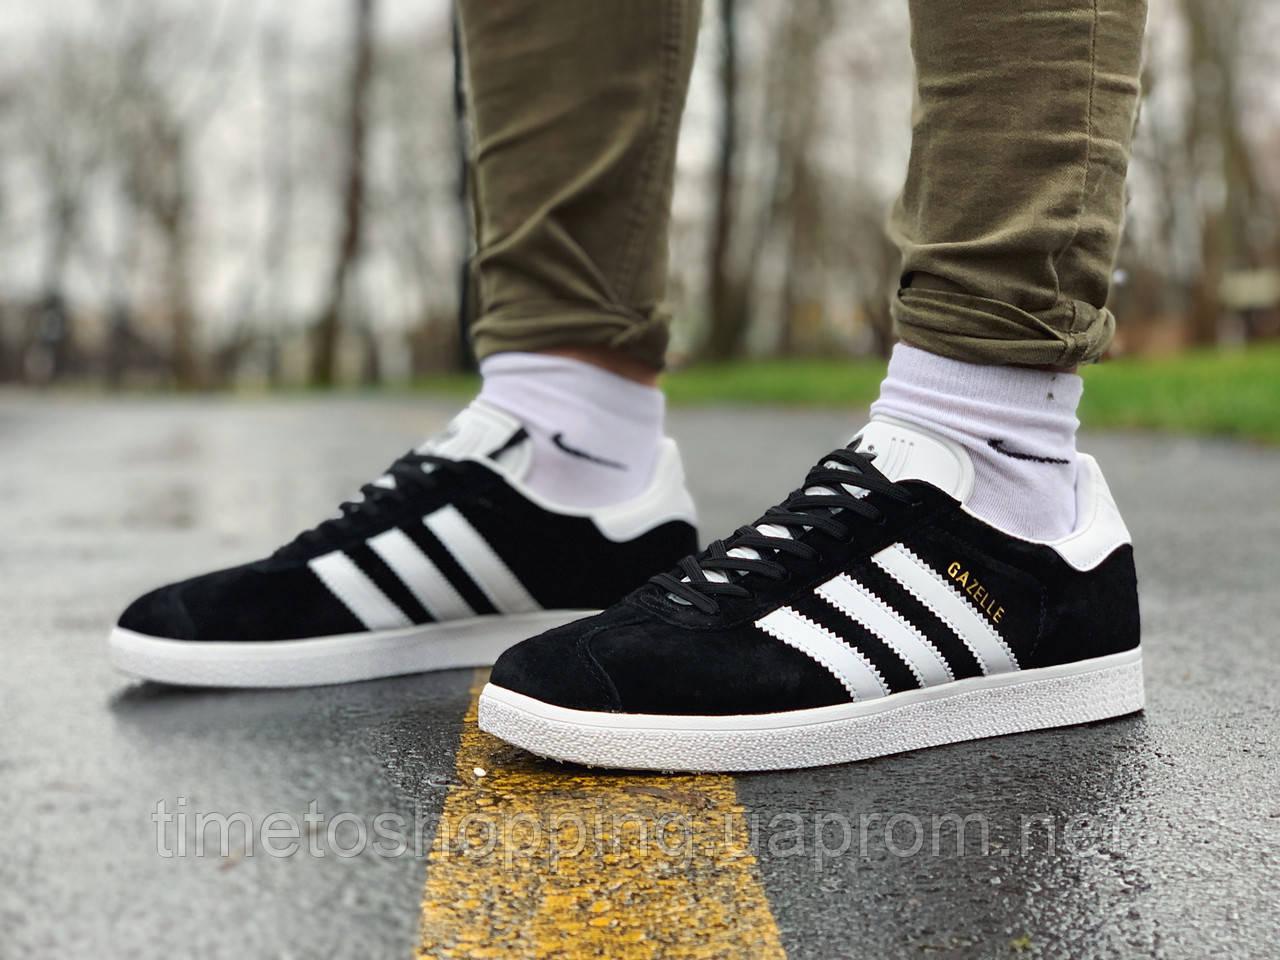 Кроссовки  натуральная замша Adidas Gazelle Адидас Газель (ТОЛЬКО 45 РАЗМЕР)